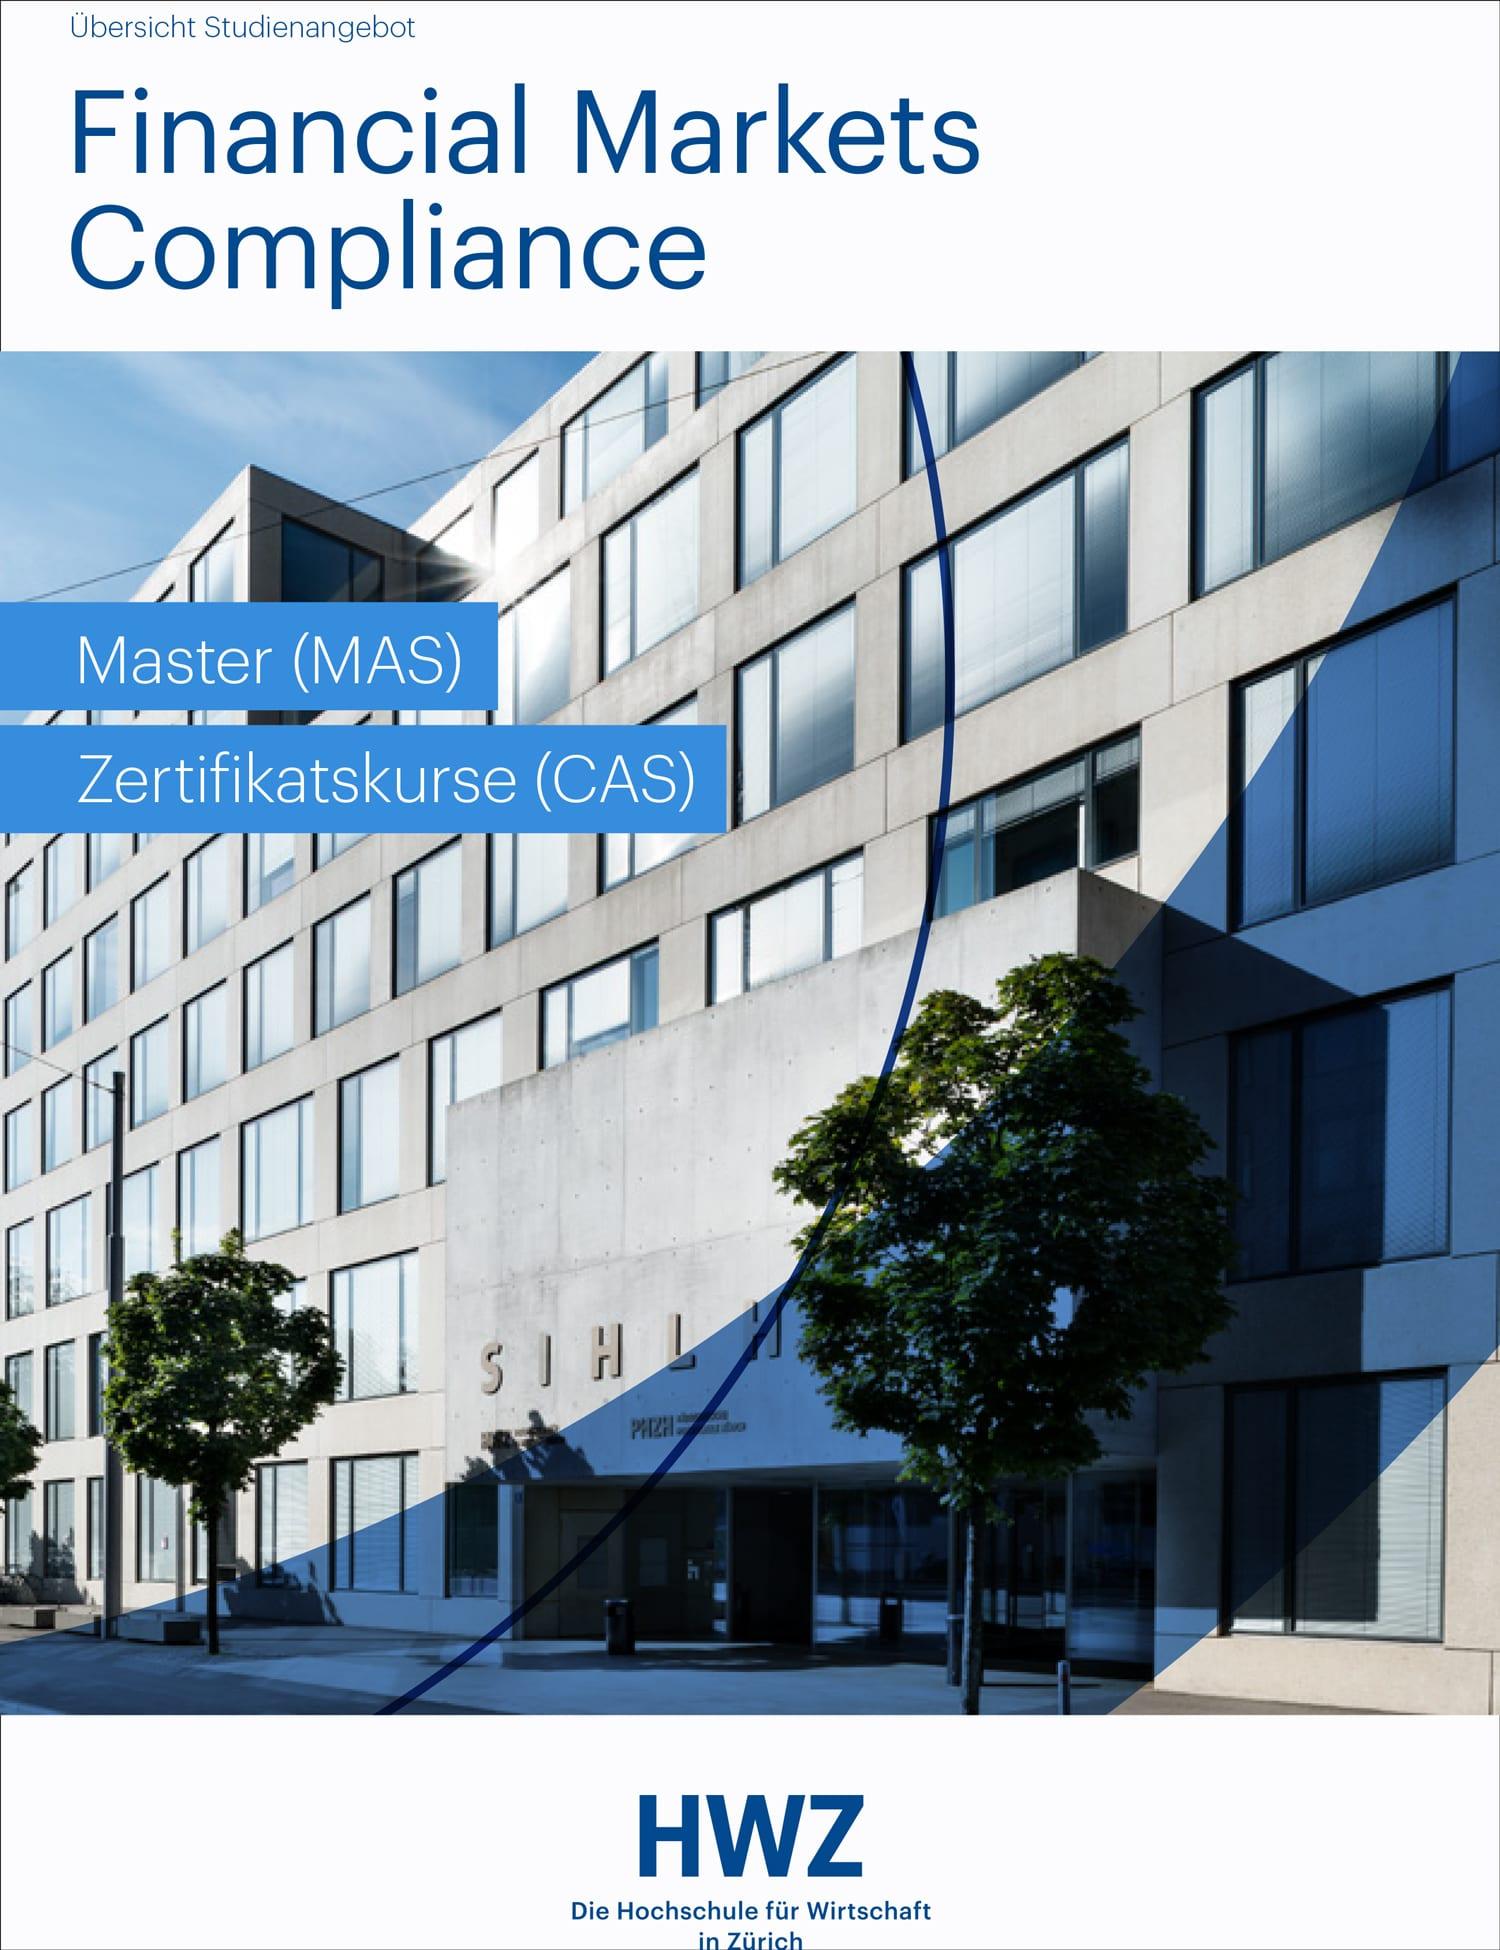 titelbild broschüre Financial Markets Compliance